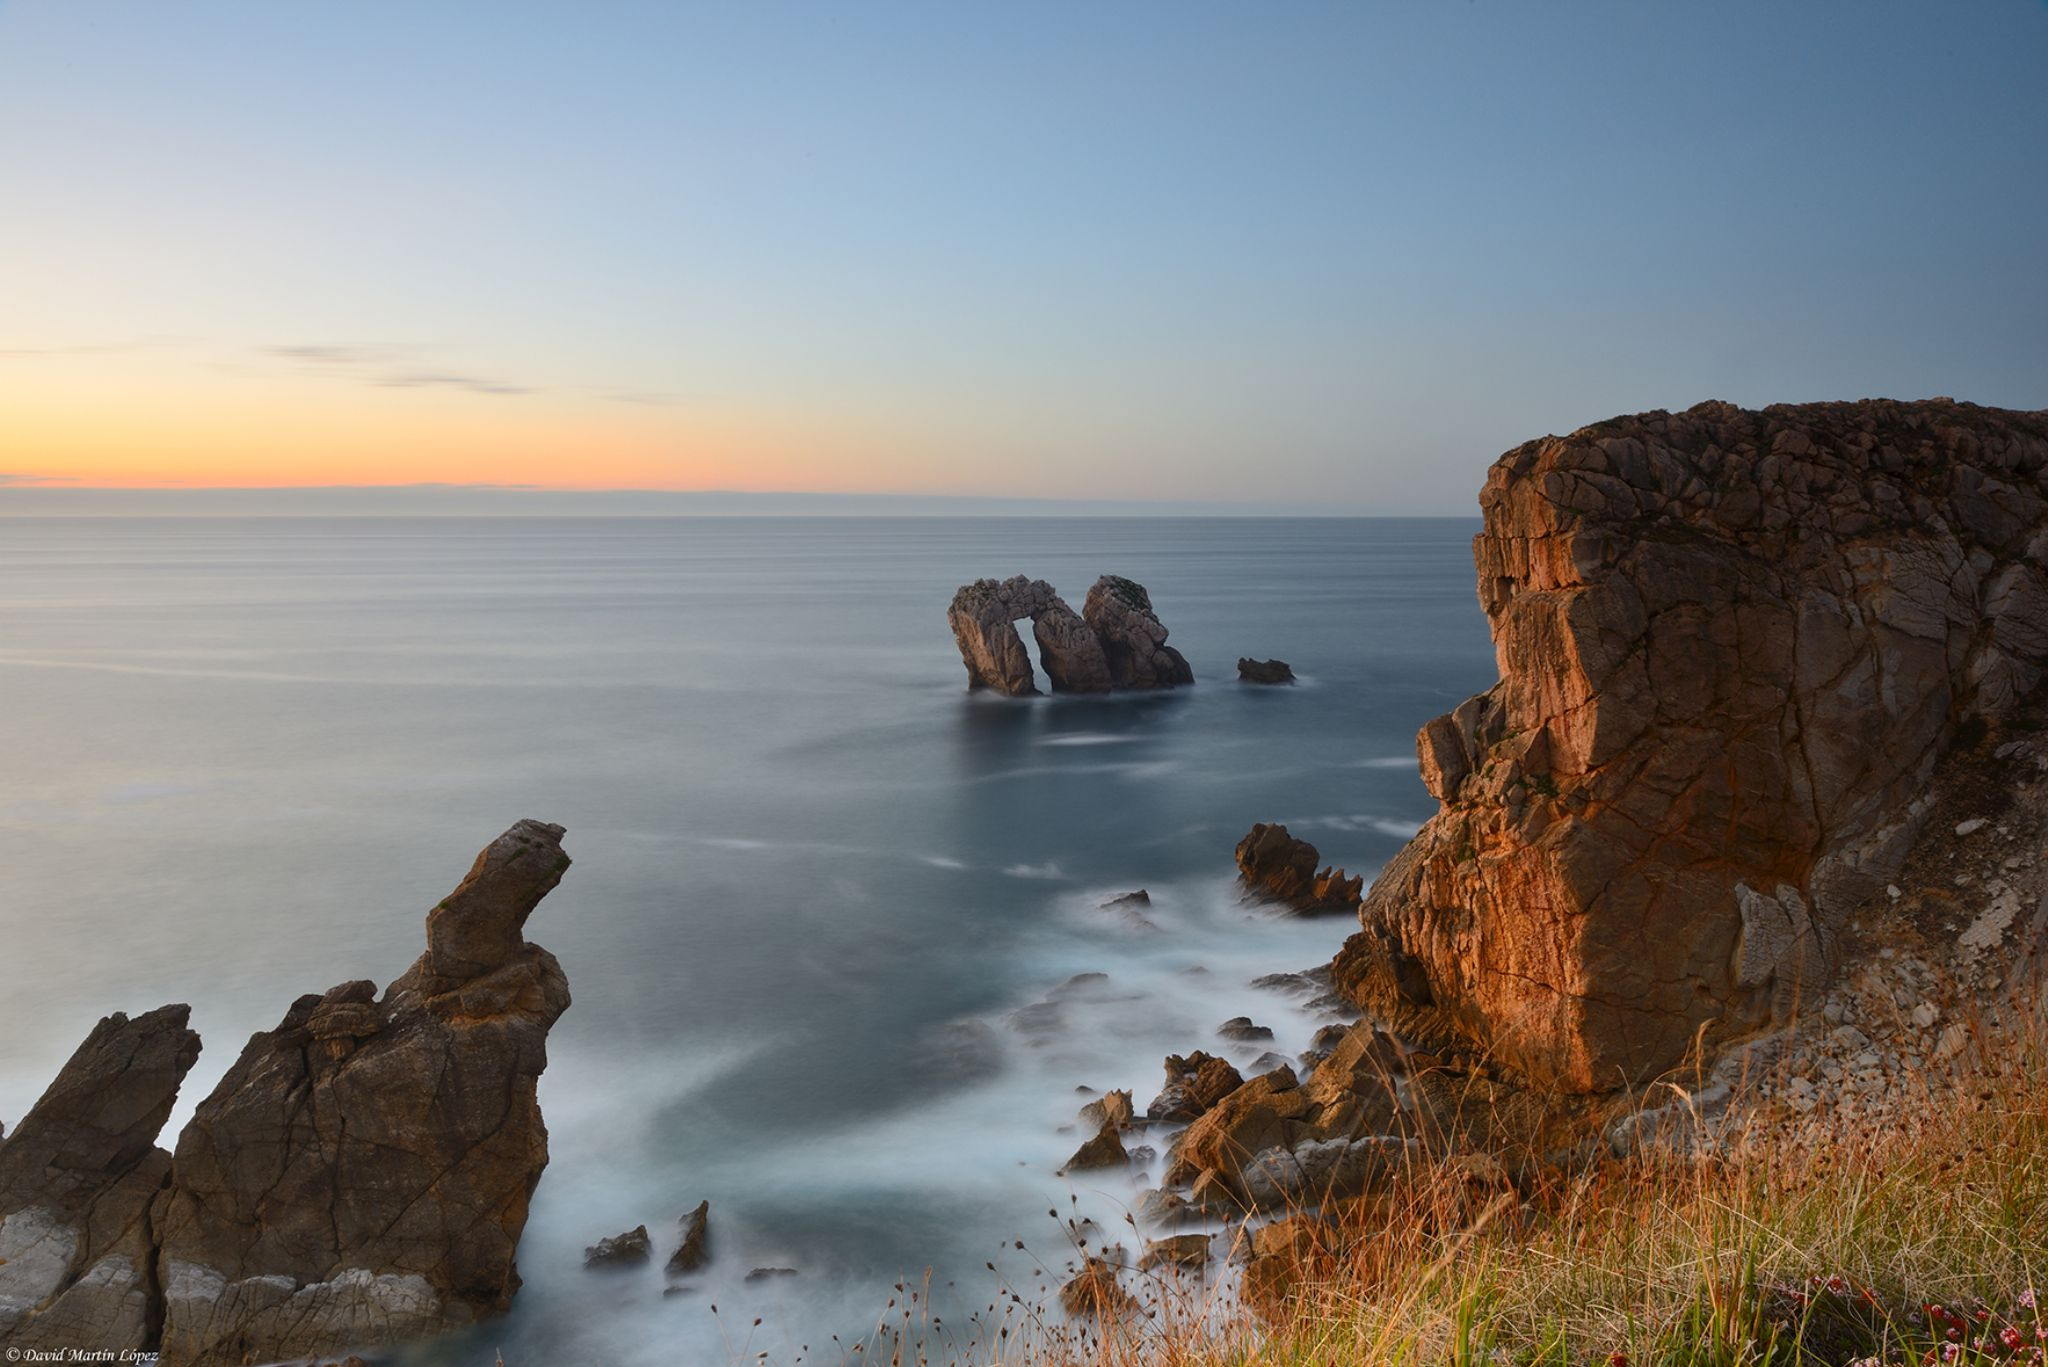 Gates to the sea by davidmartinlopez